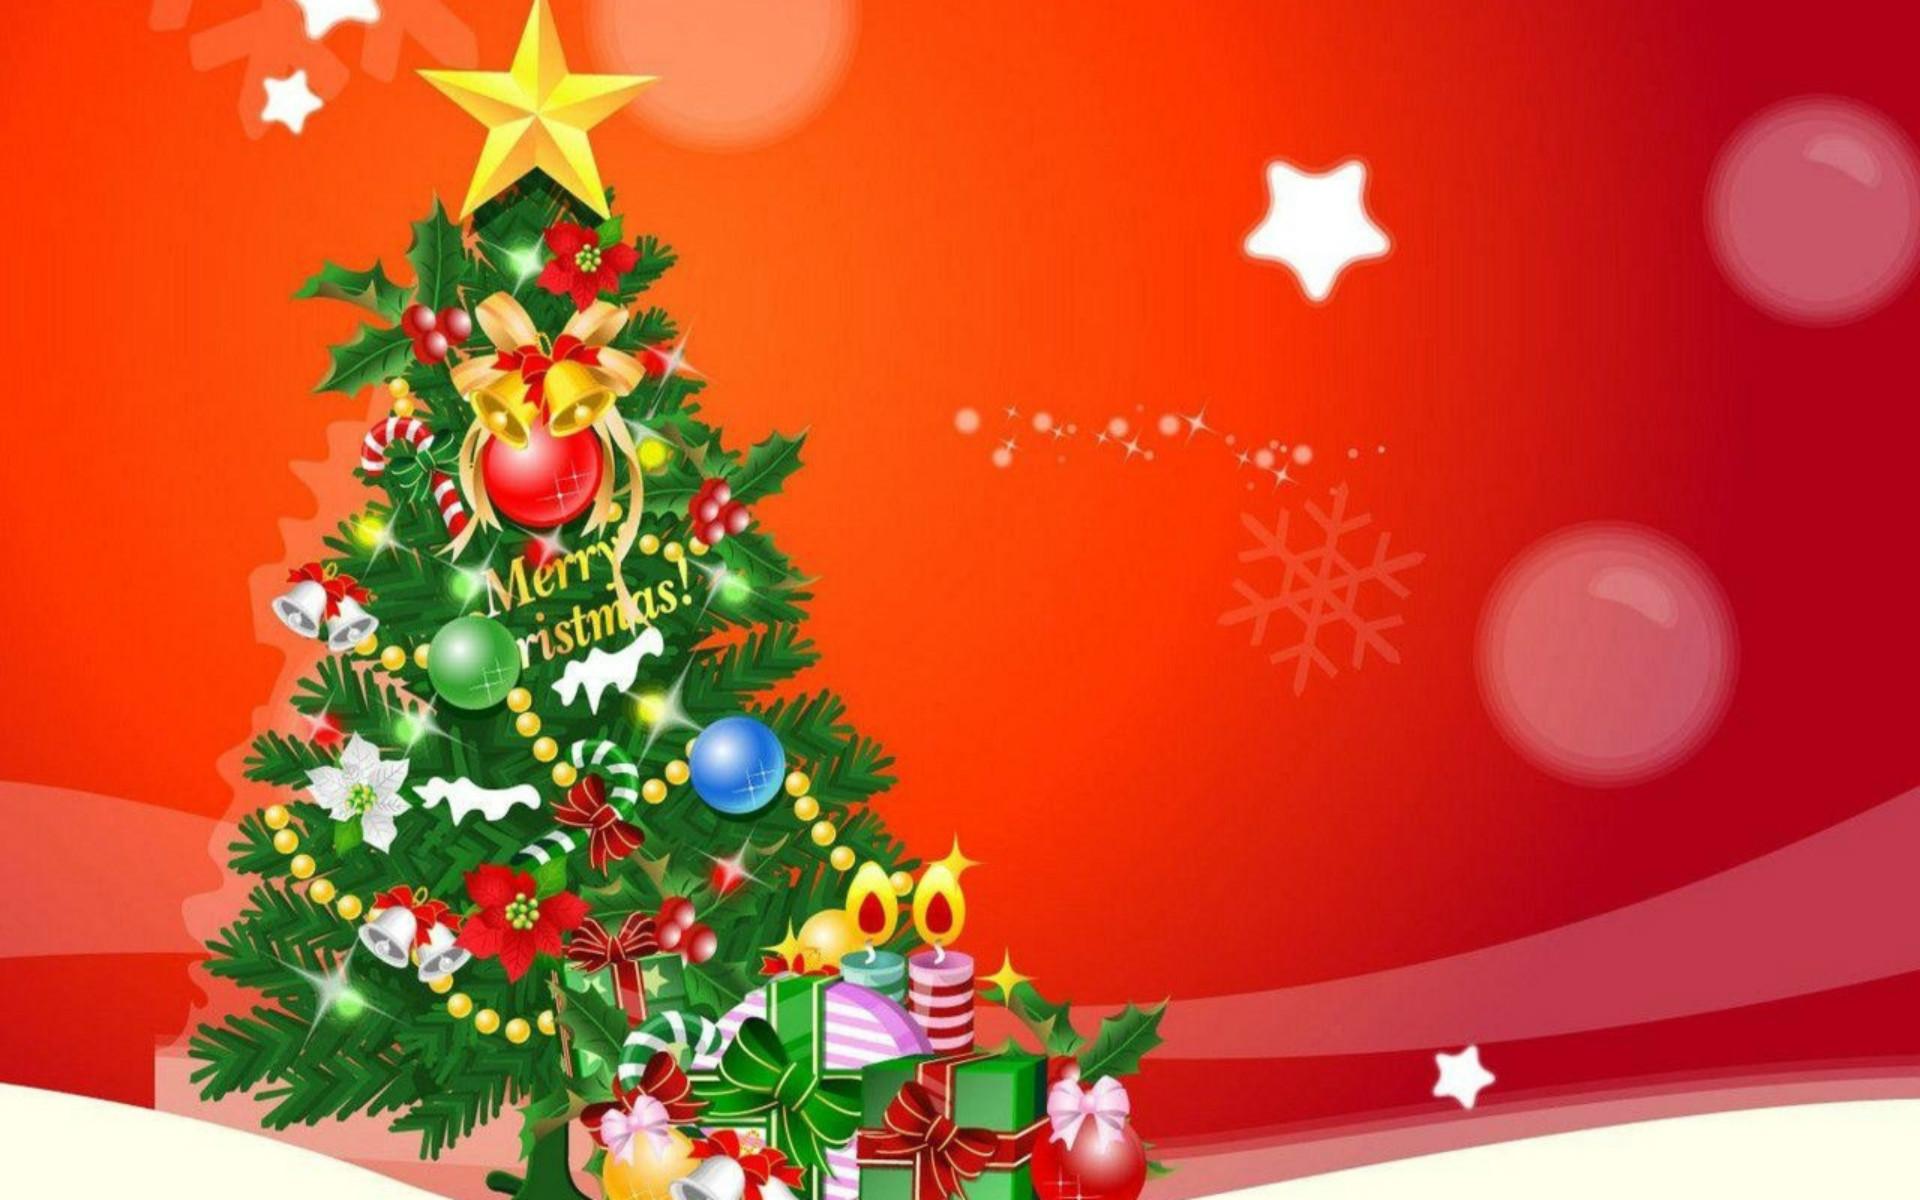 christmas background images christmas desktop wallpaper christmas tree  wallpaper free christmas wallpaper backgrounds merry christmas wallpaper  2016-11-14